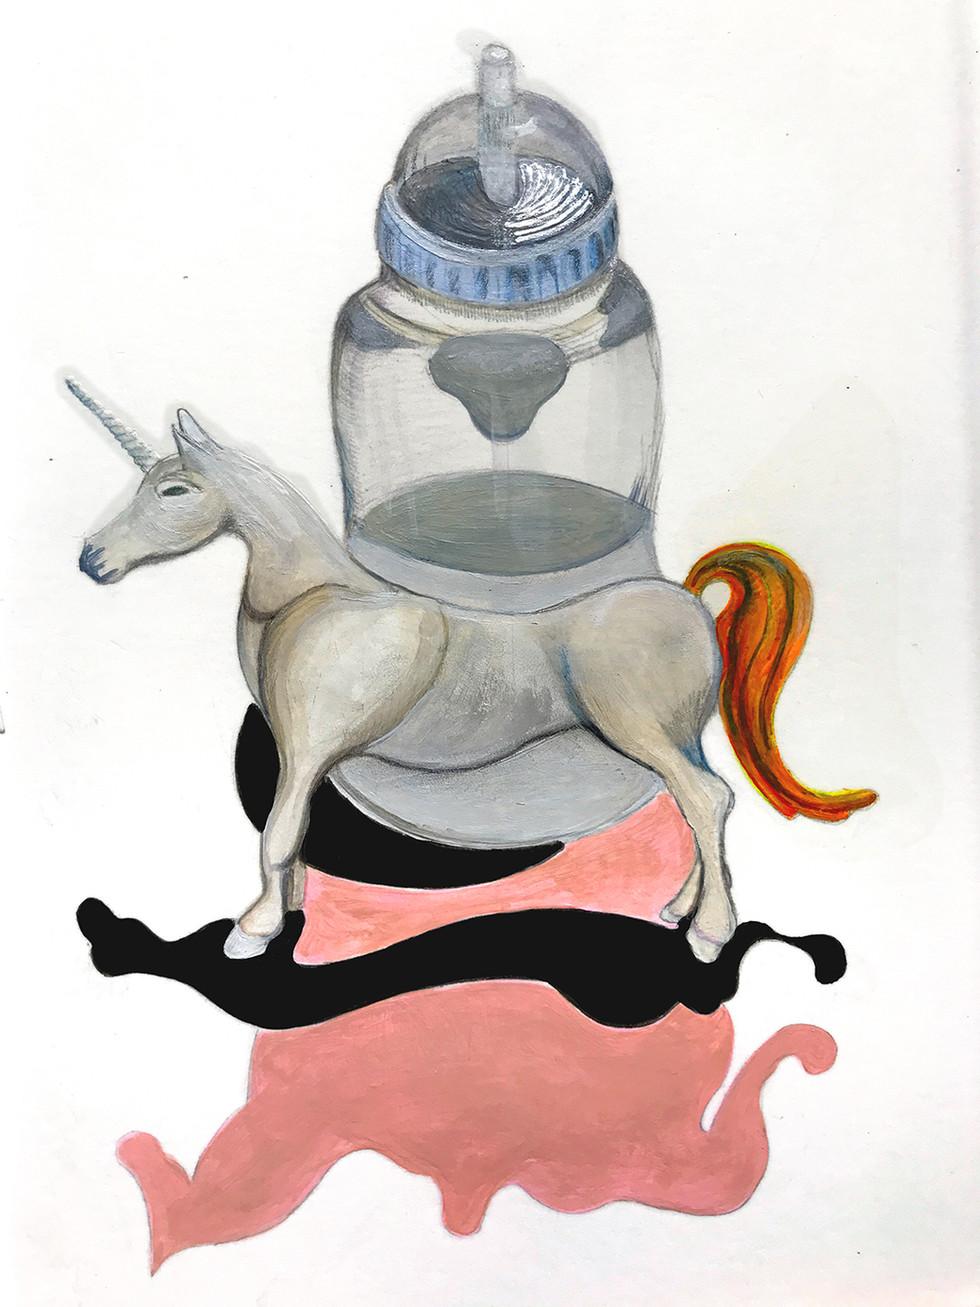 unicorn's bottle